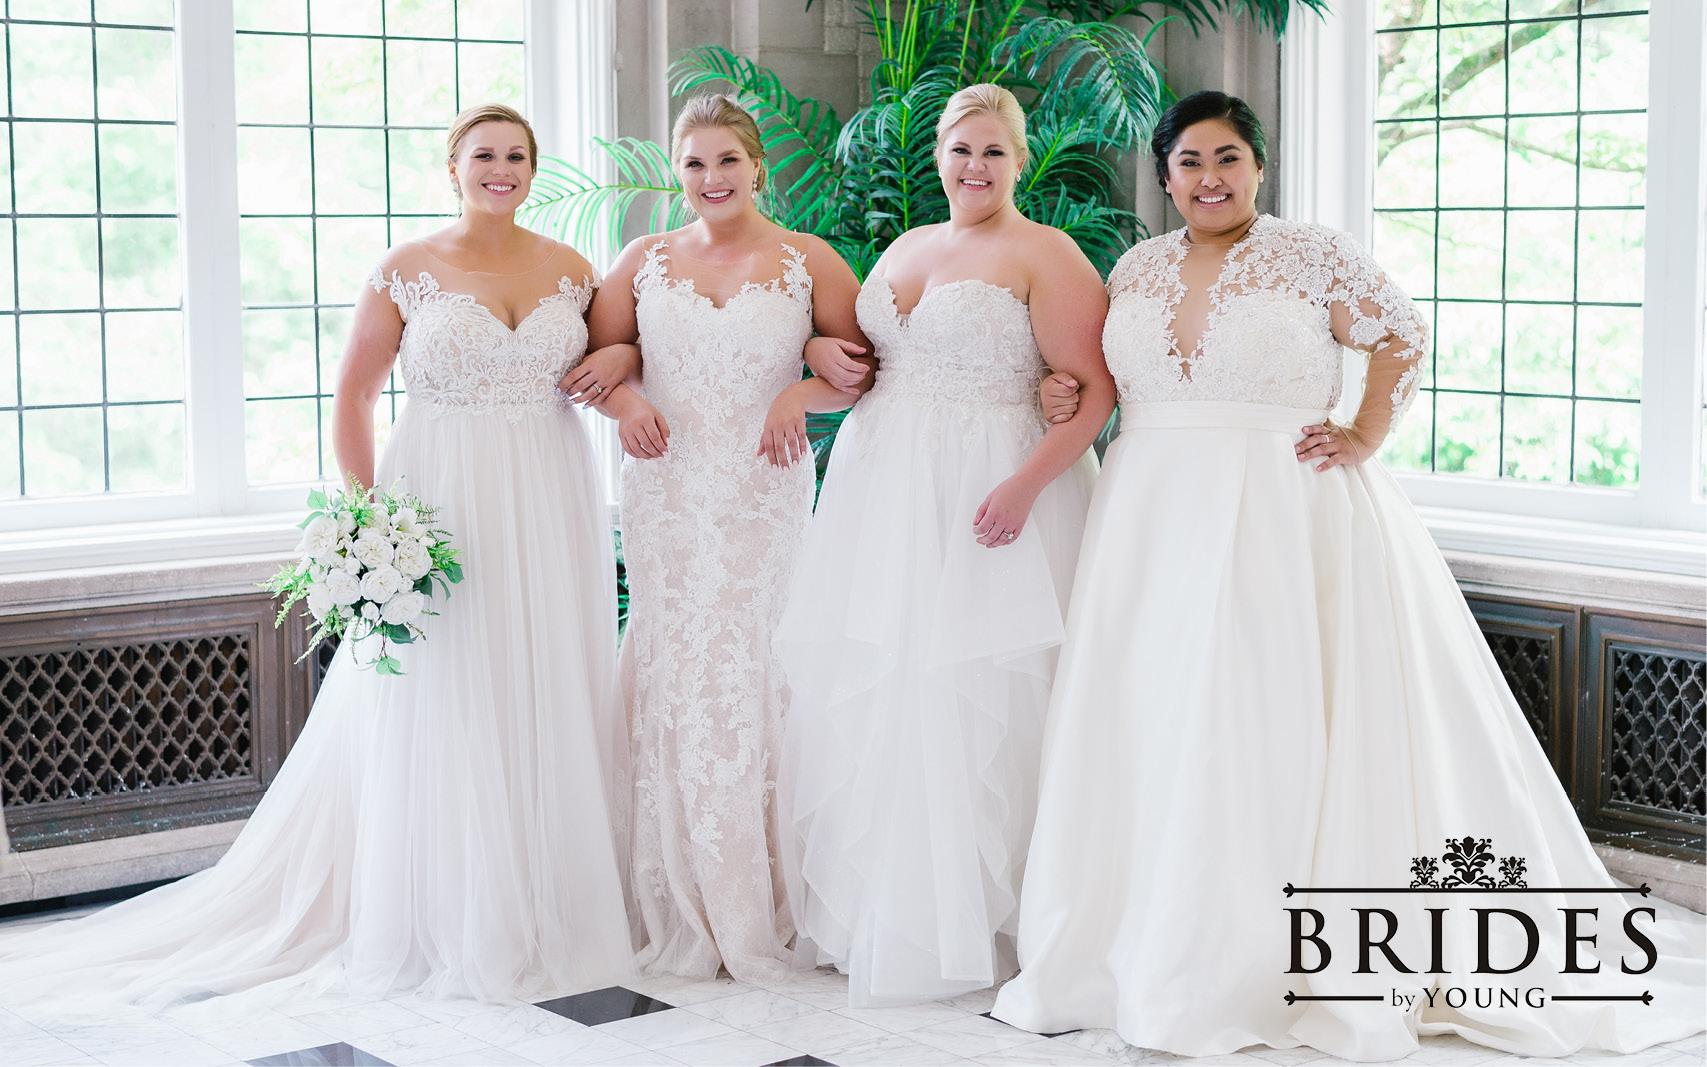 BridesbyYoung-2020Collection-PlusSizeBridalBoutique-CurvyWeddingDressInspiration-211.jpg